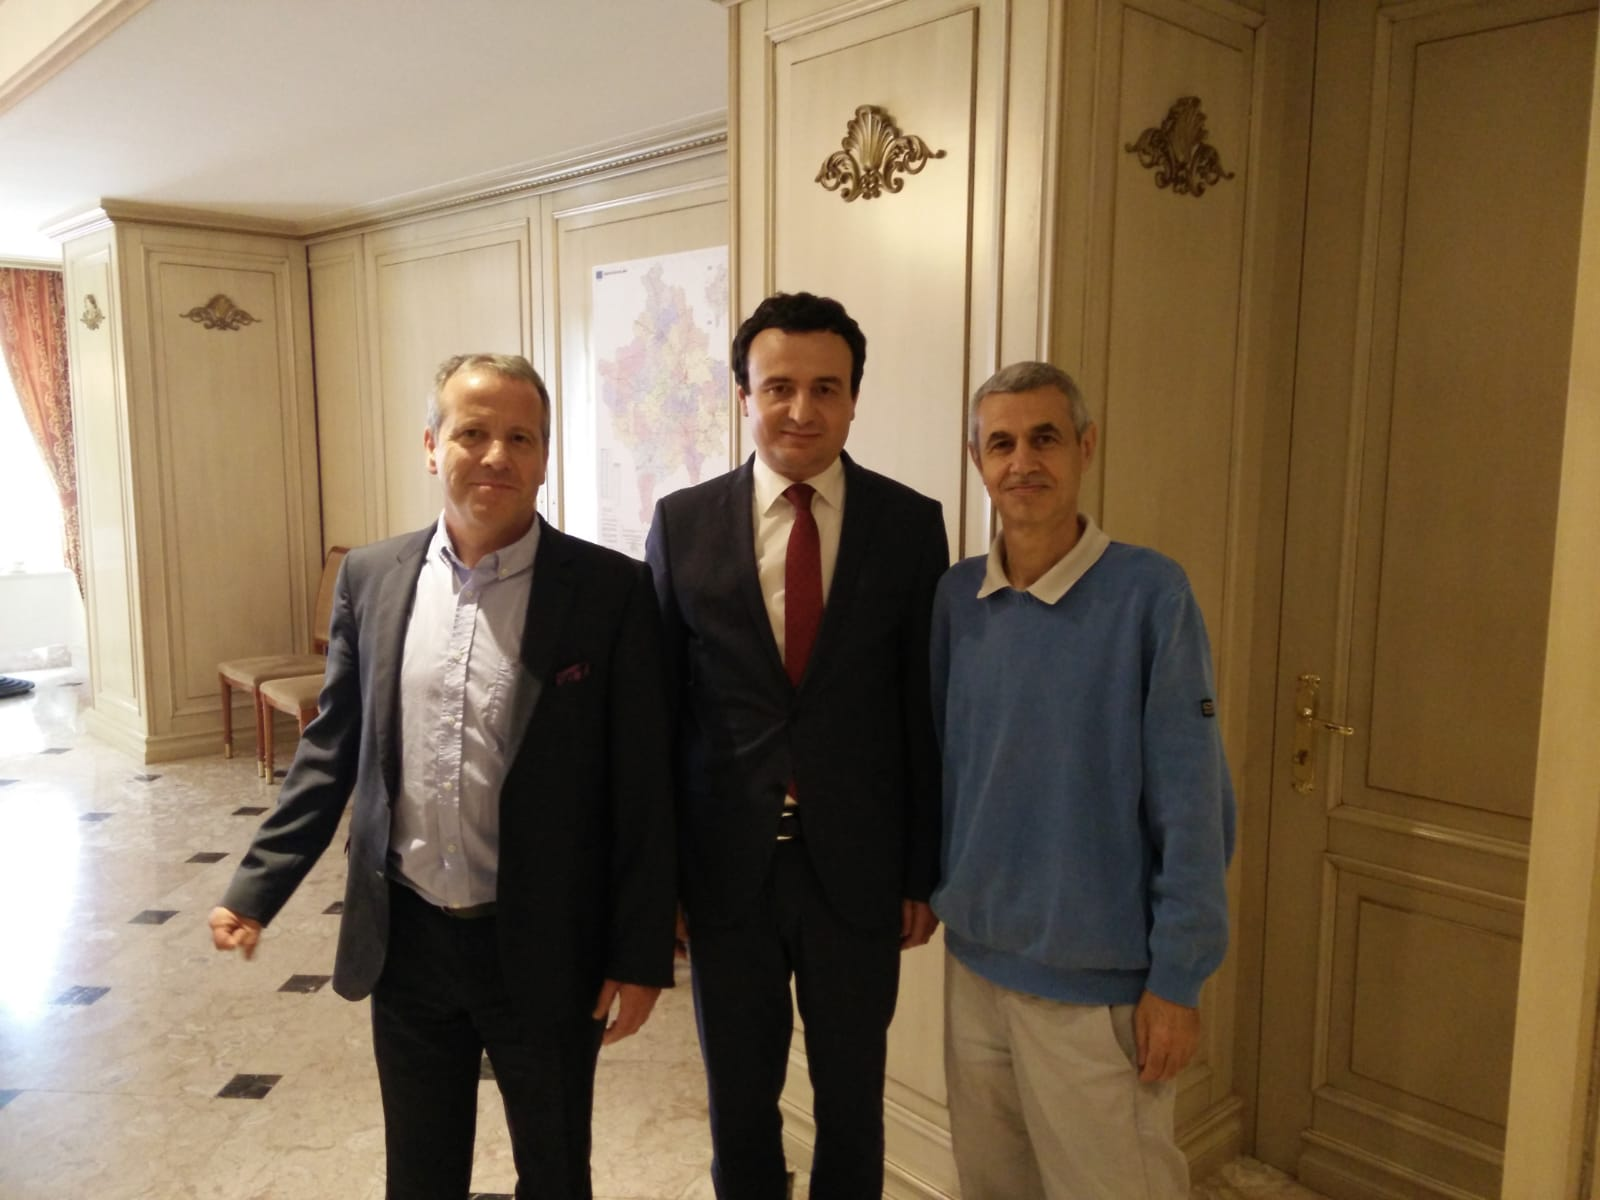 Da sinistra: l'ex eurodeputato Igor Soltes, Albin Kurti e Paolo Bergamaschi